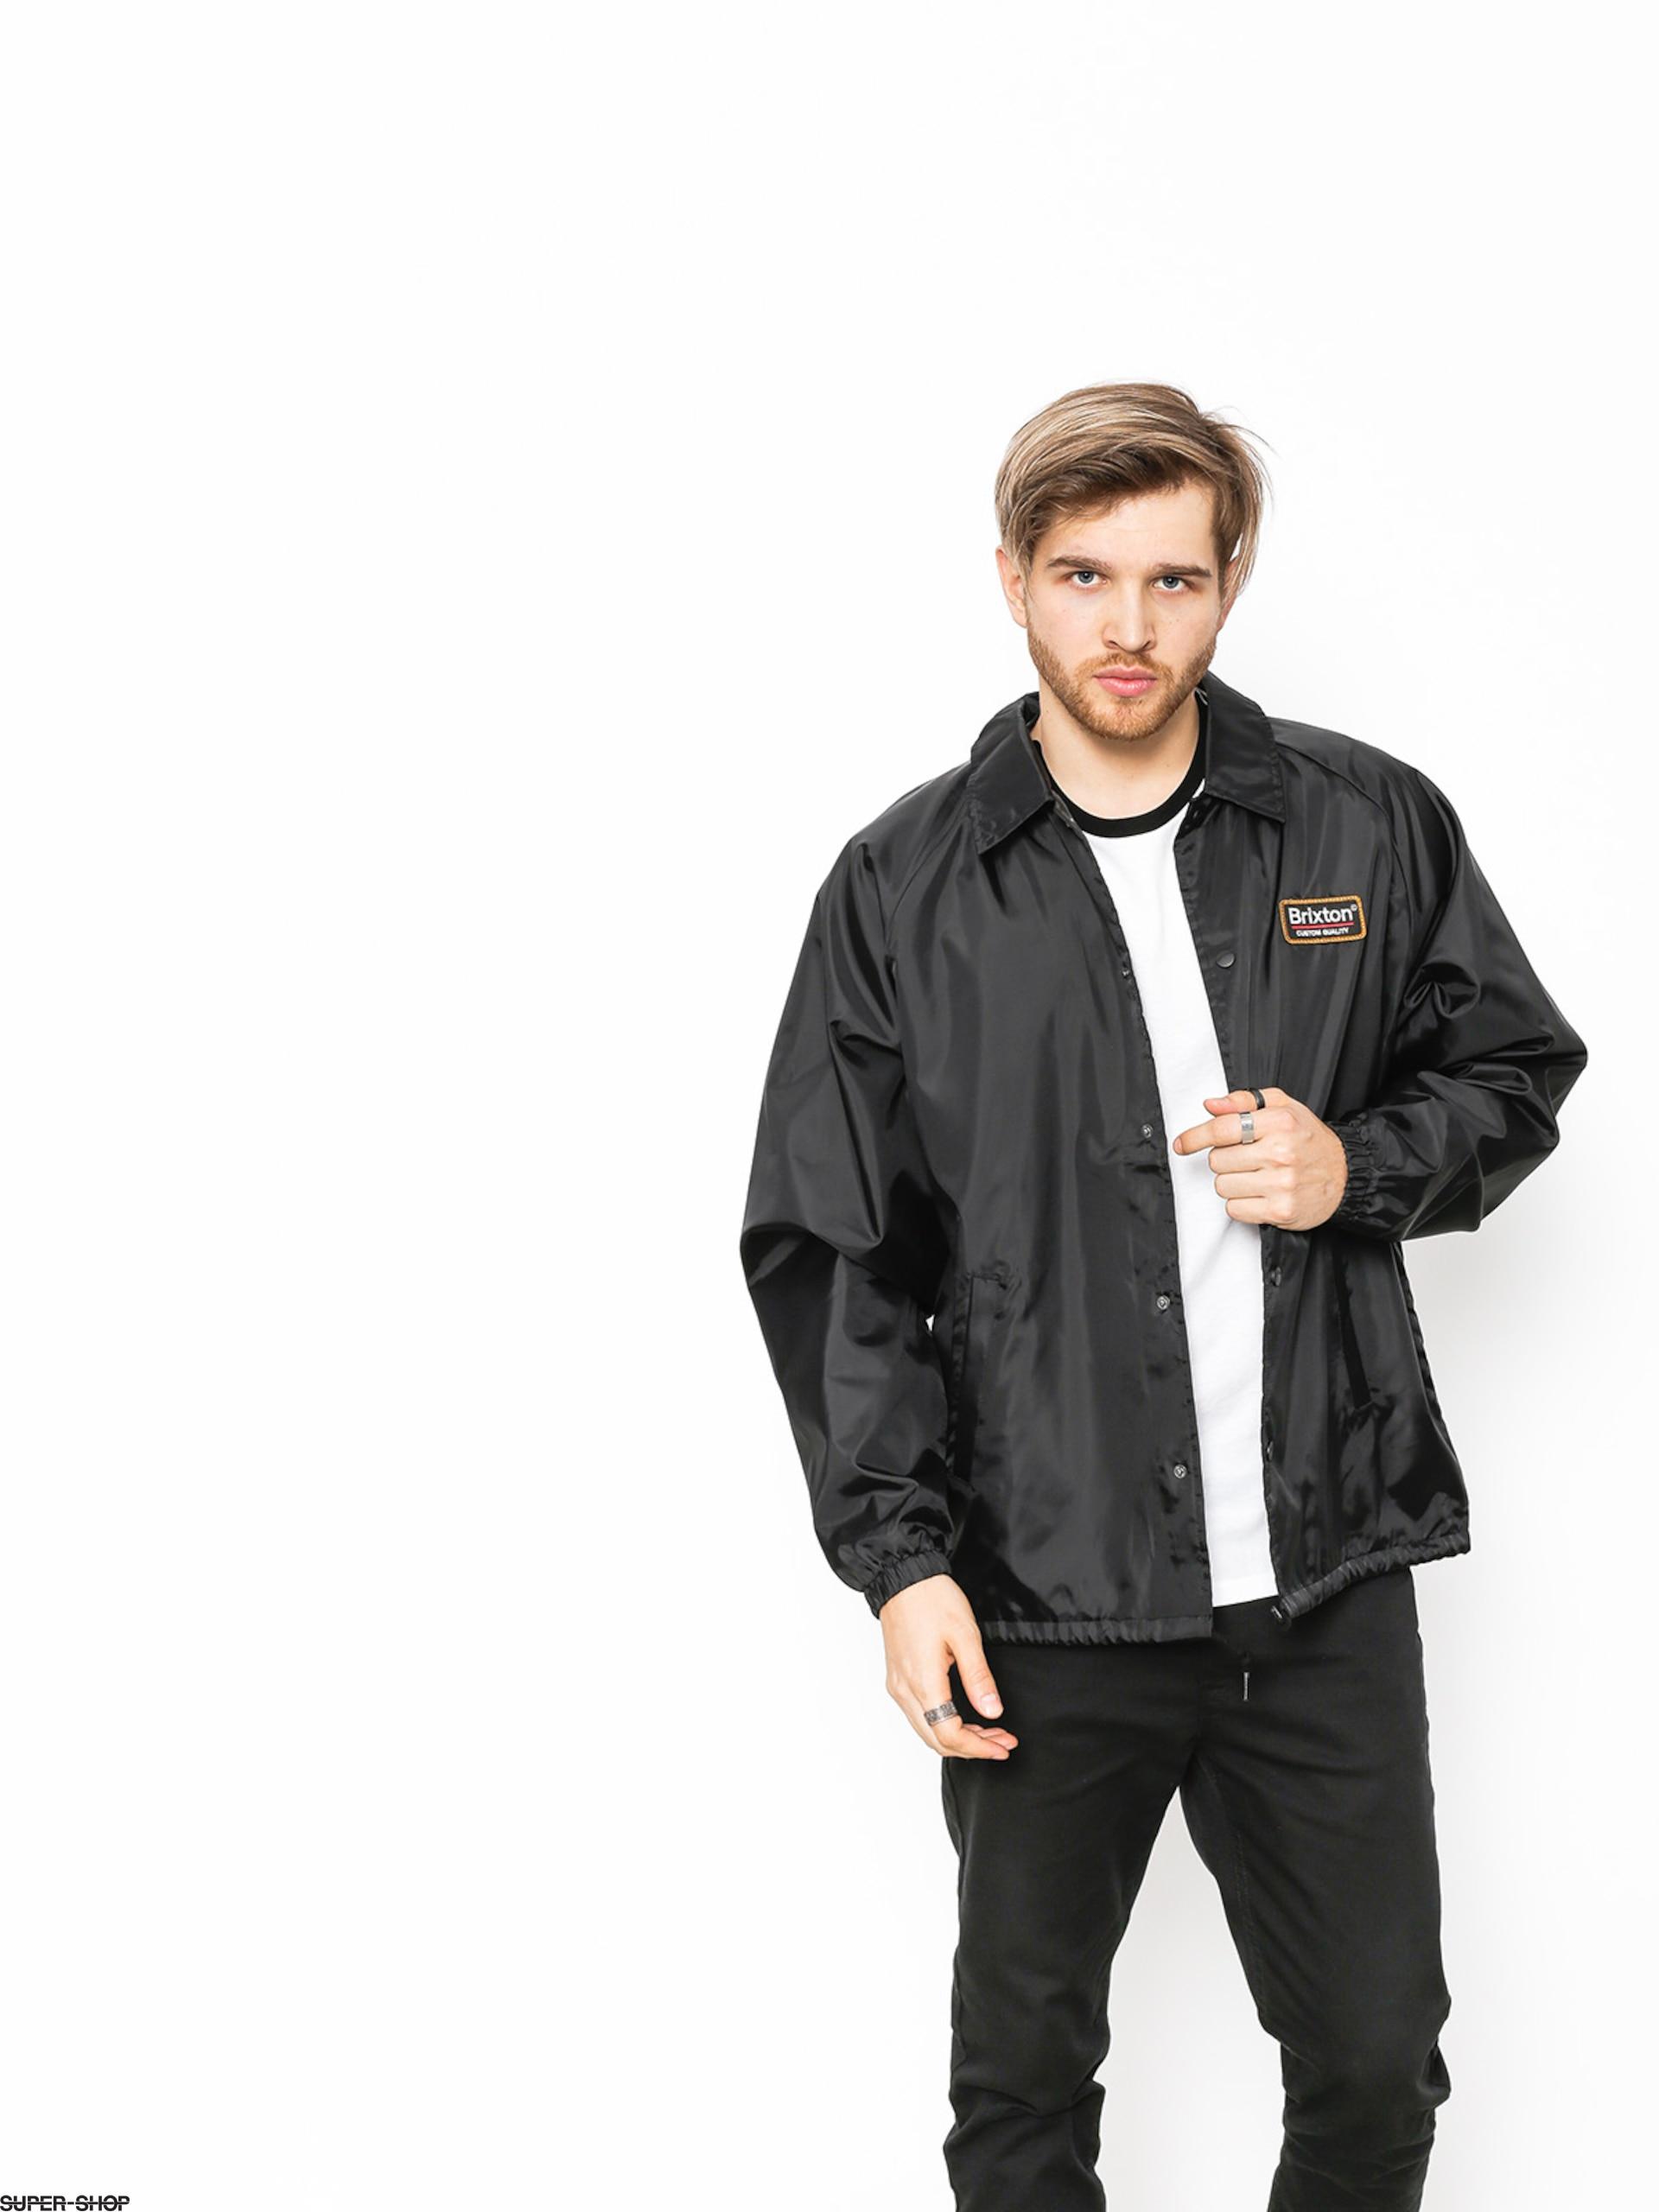 933319-w1920-brixton-jacket-palmer-black.jpg 8a2e25c0e61